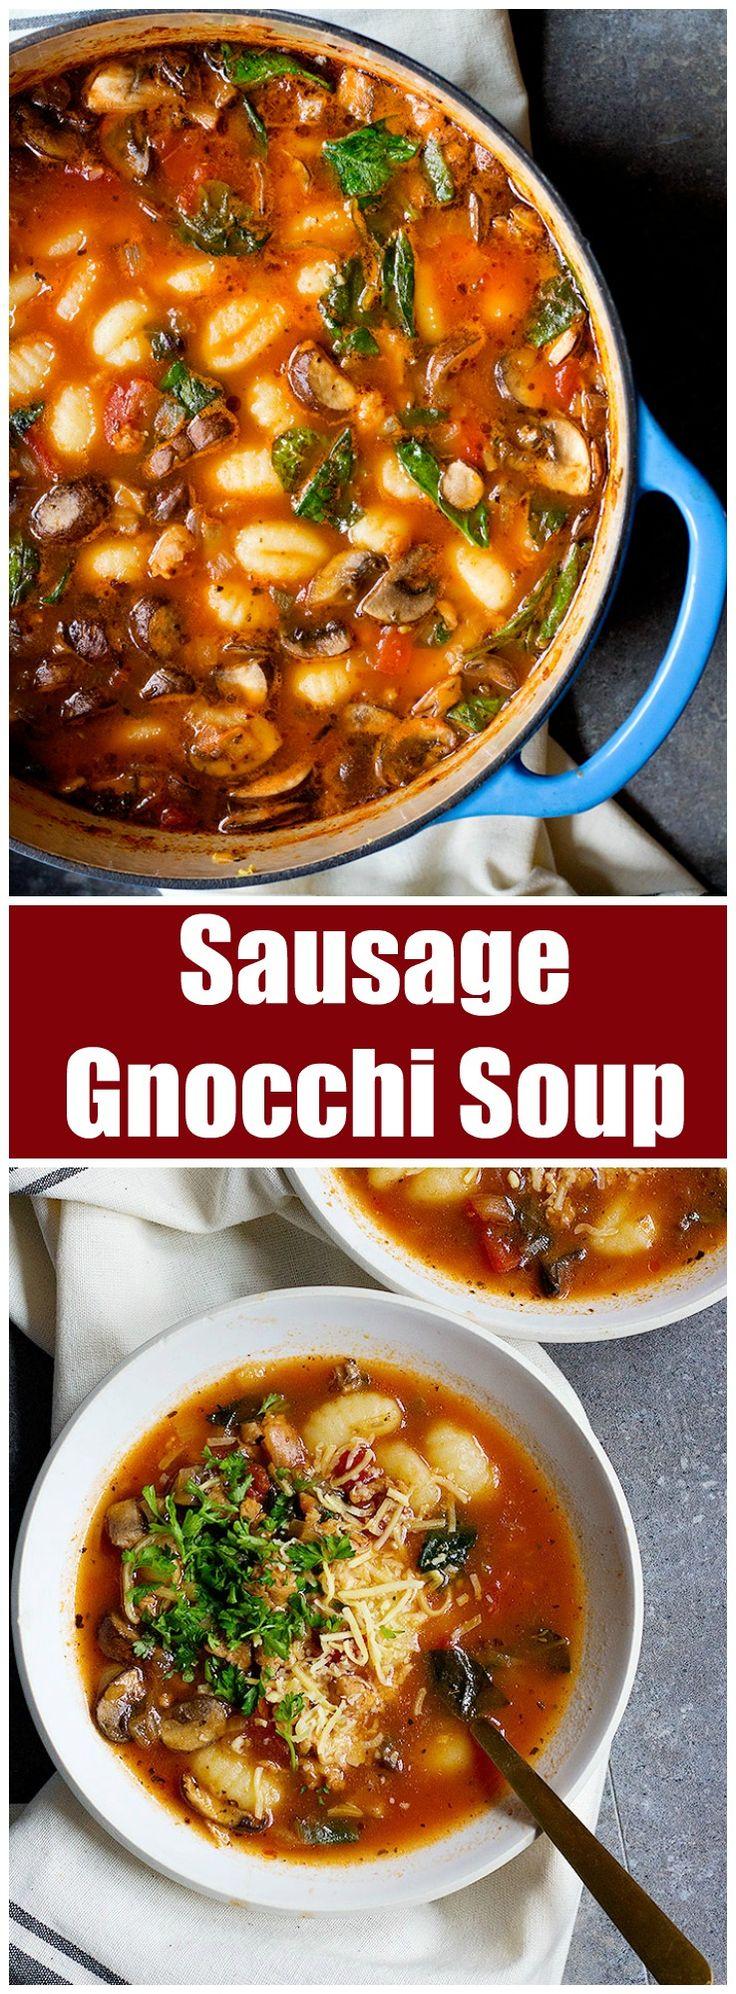 Sausage Gnocchi Soup | Unicornsinthekitchen.com